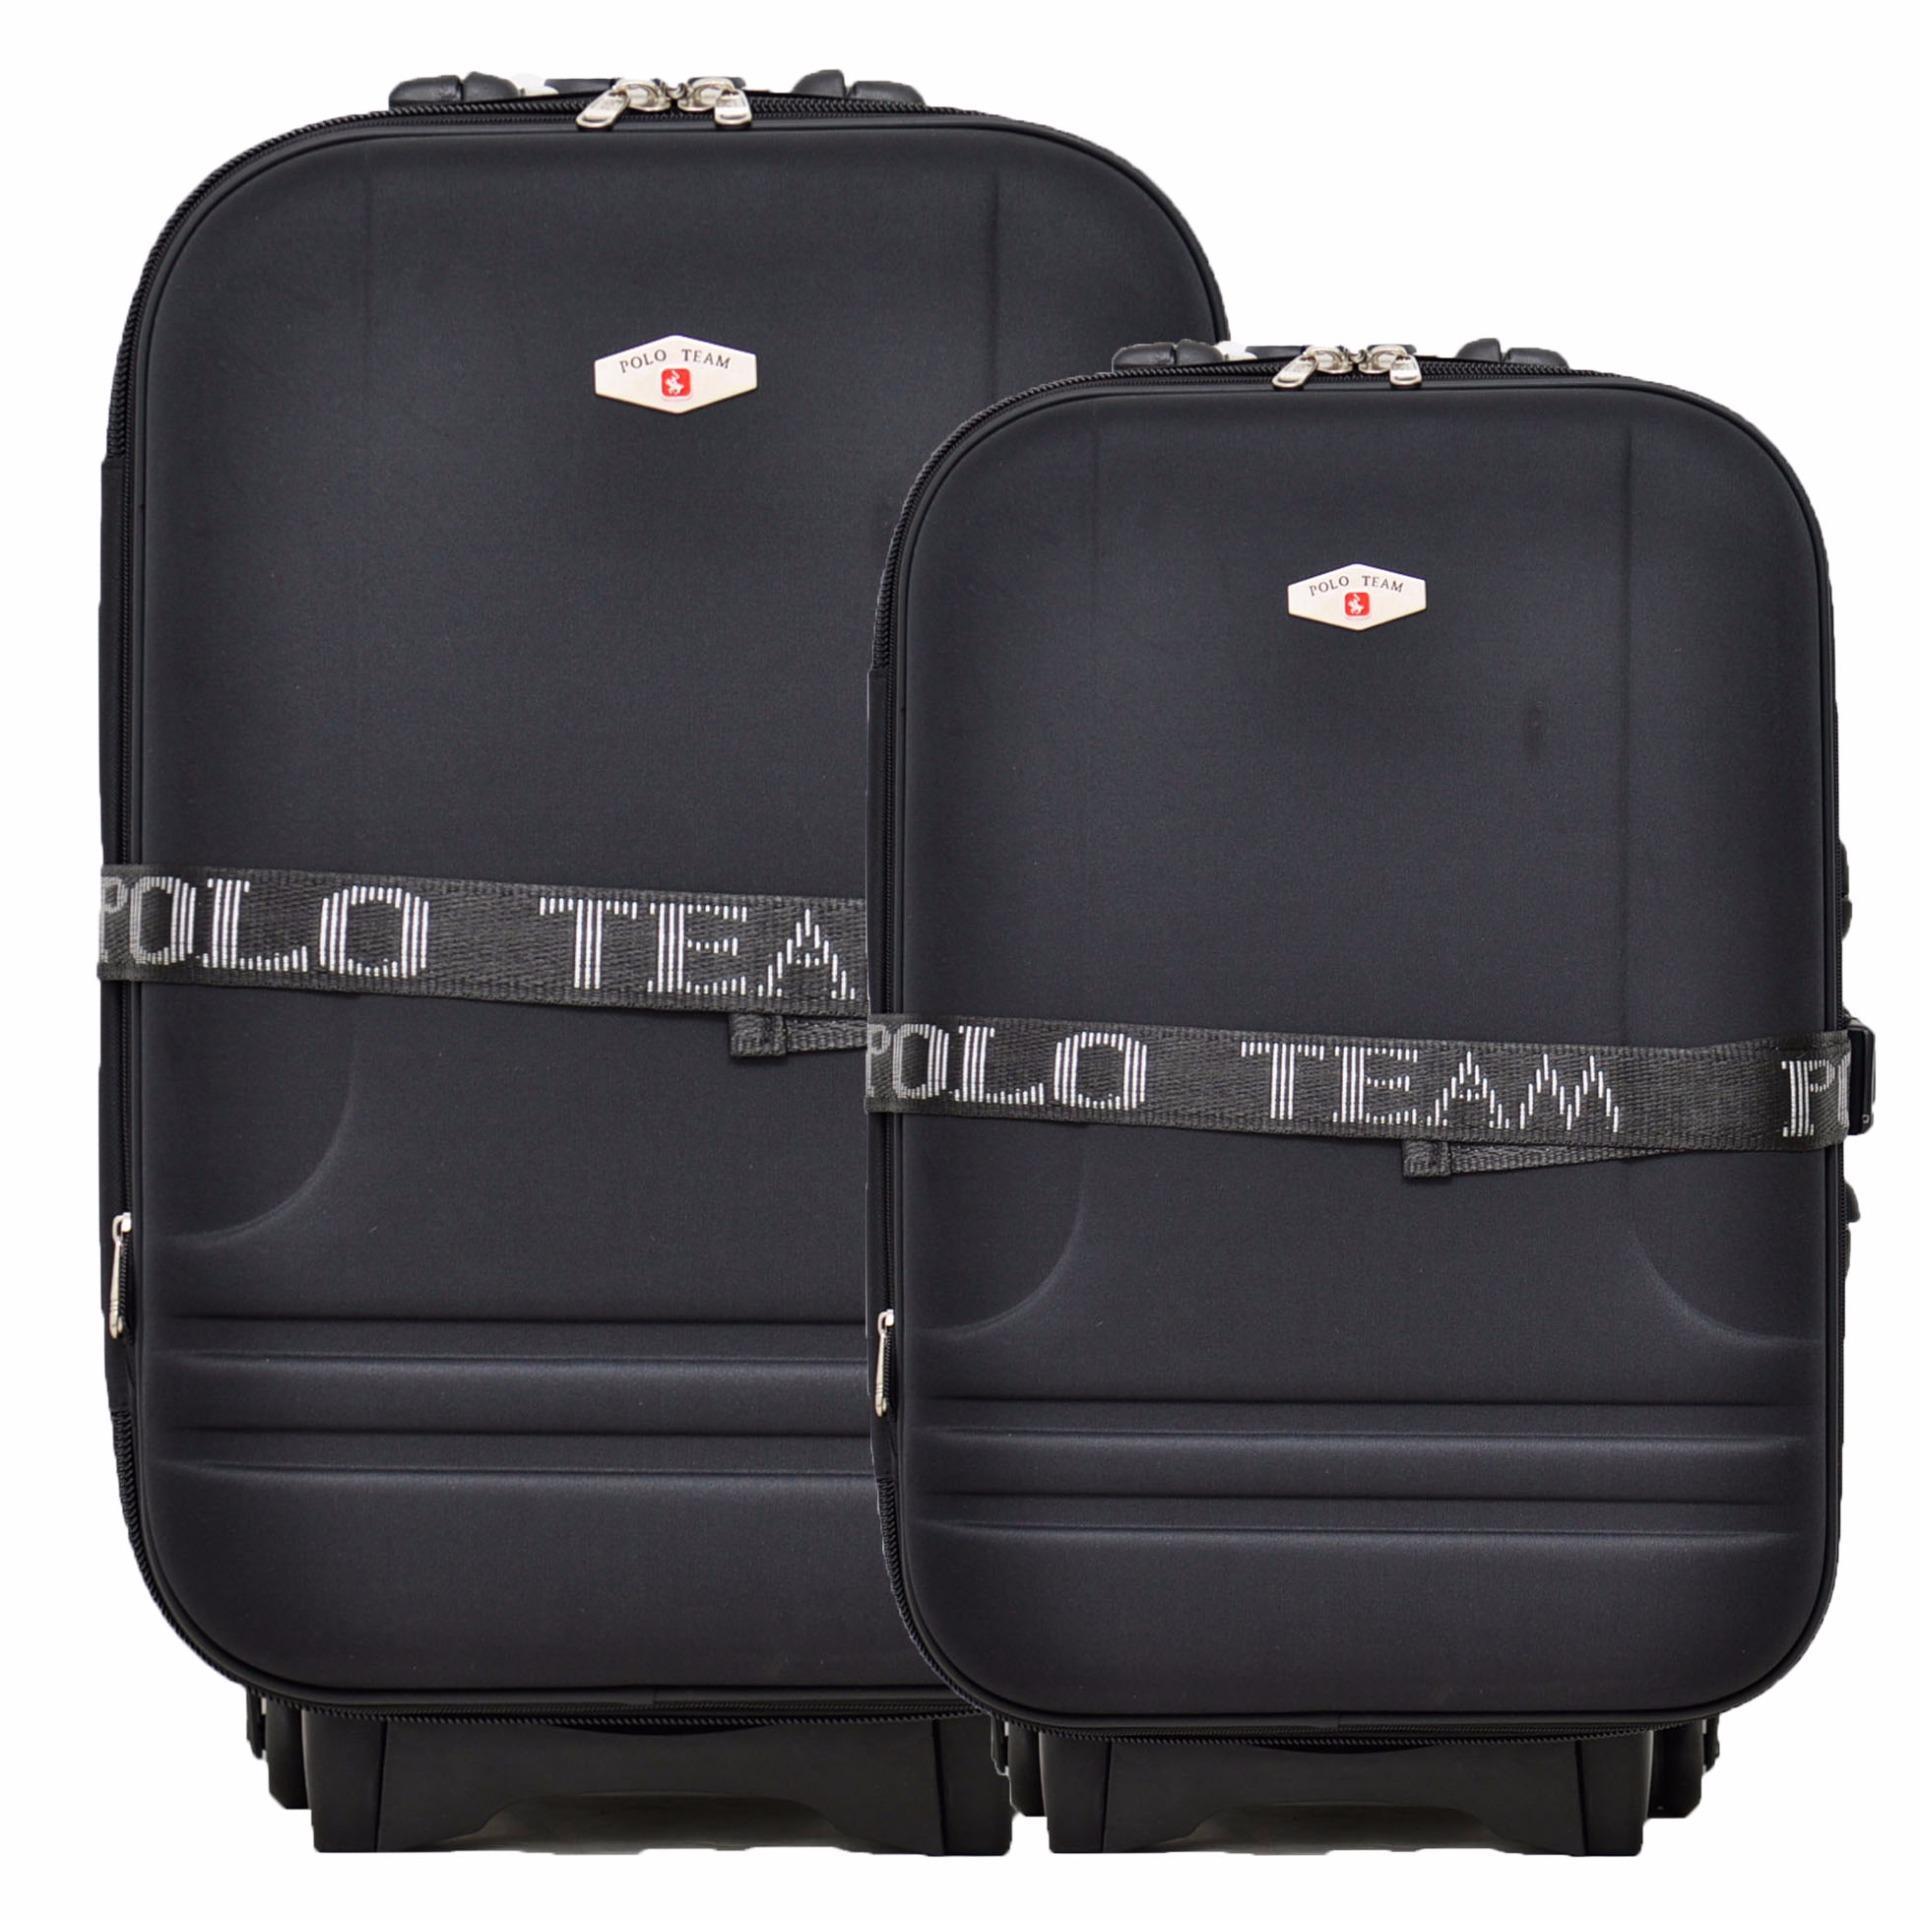 Ulasan Lengkap Polo Team Tas Koper Expander 2 Roda Set Size 24 20 Inch 931 Hitam